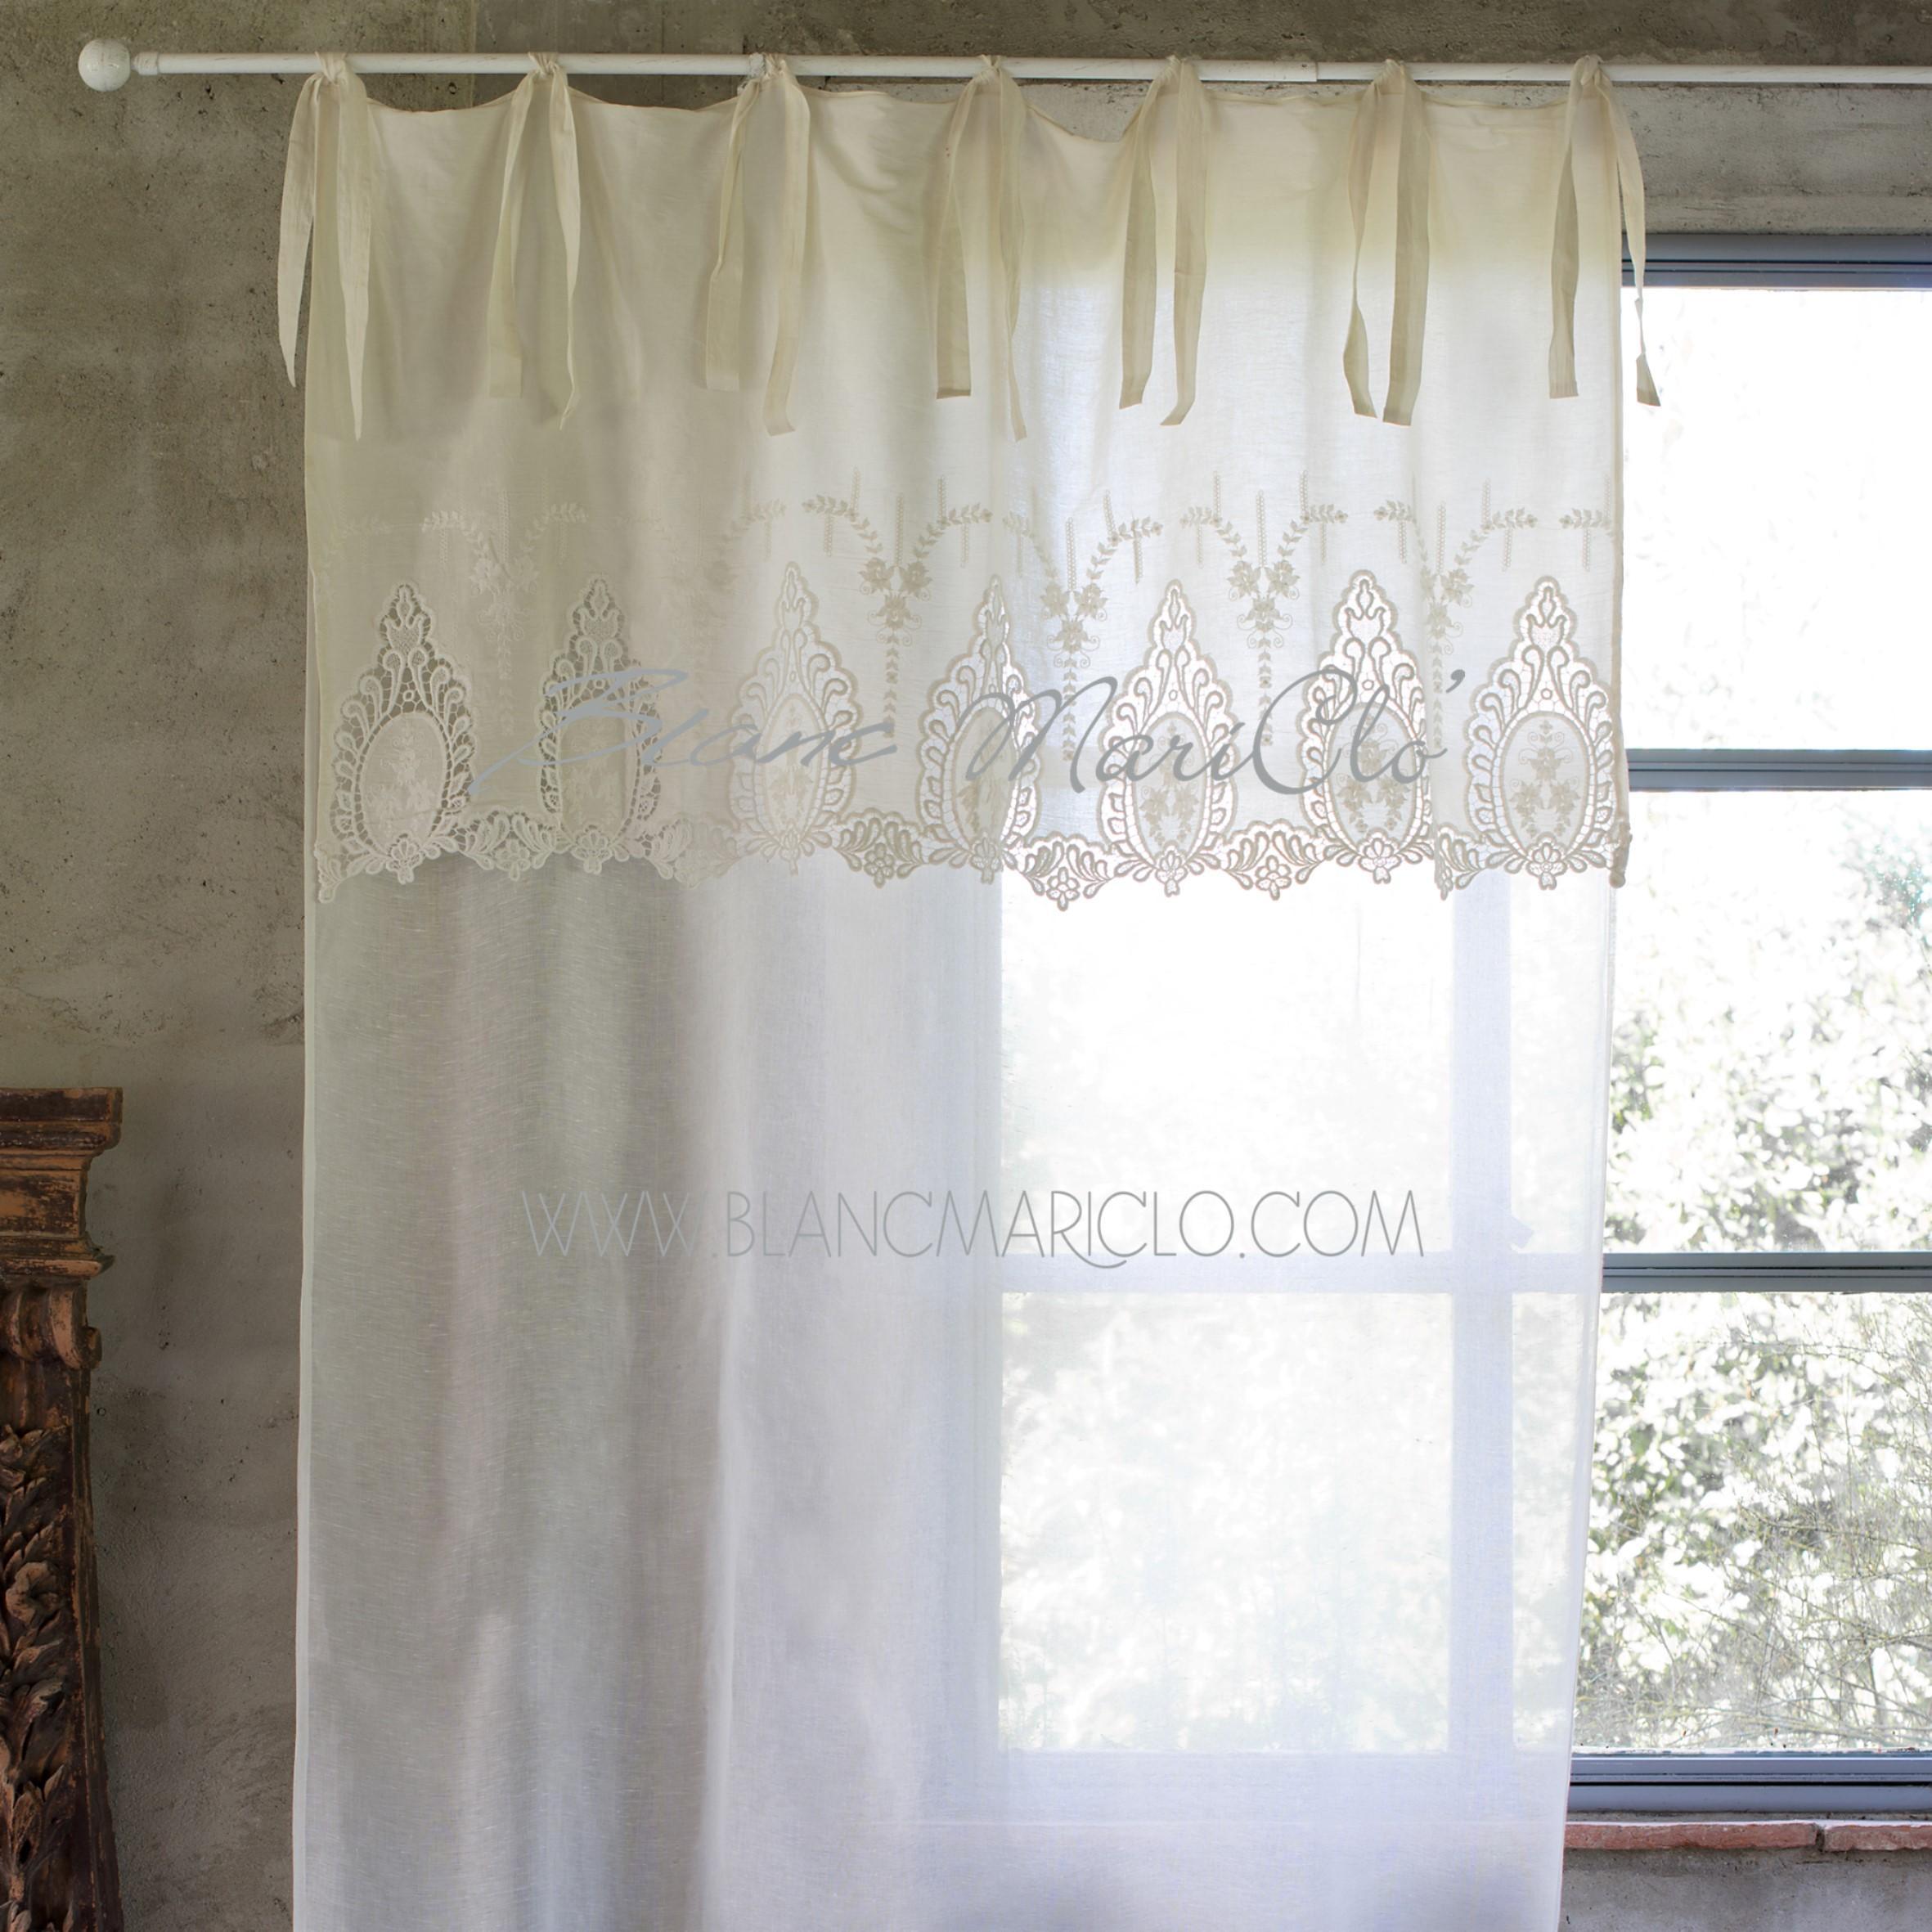 Blanc mariclo follie shop online shabby chic - Tende camera da letto maison du monde ...